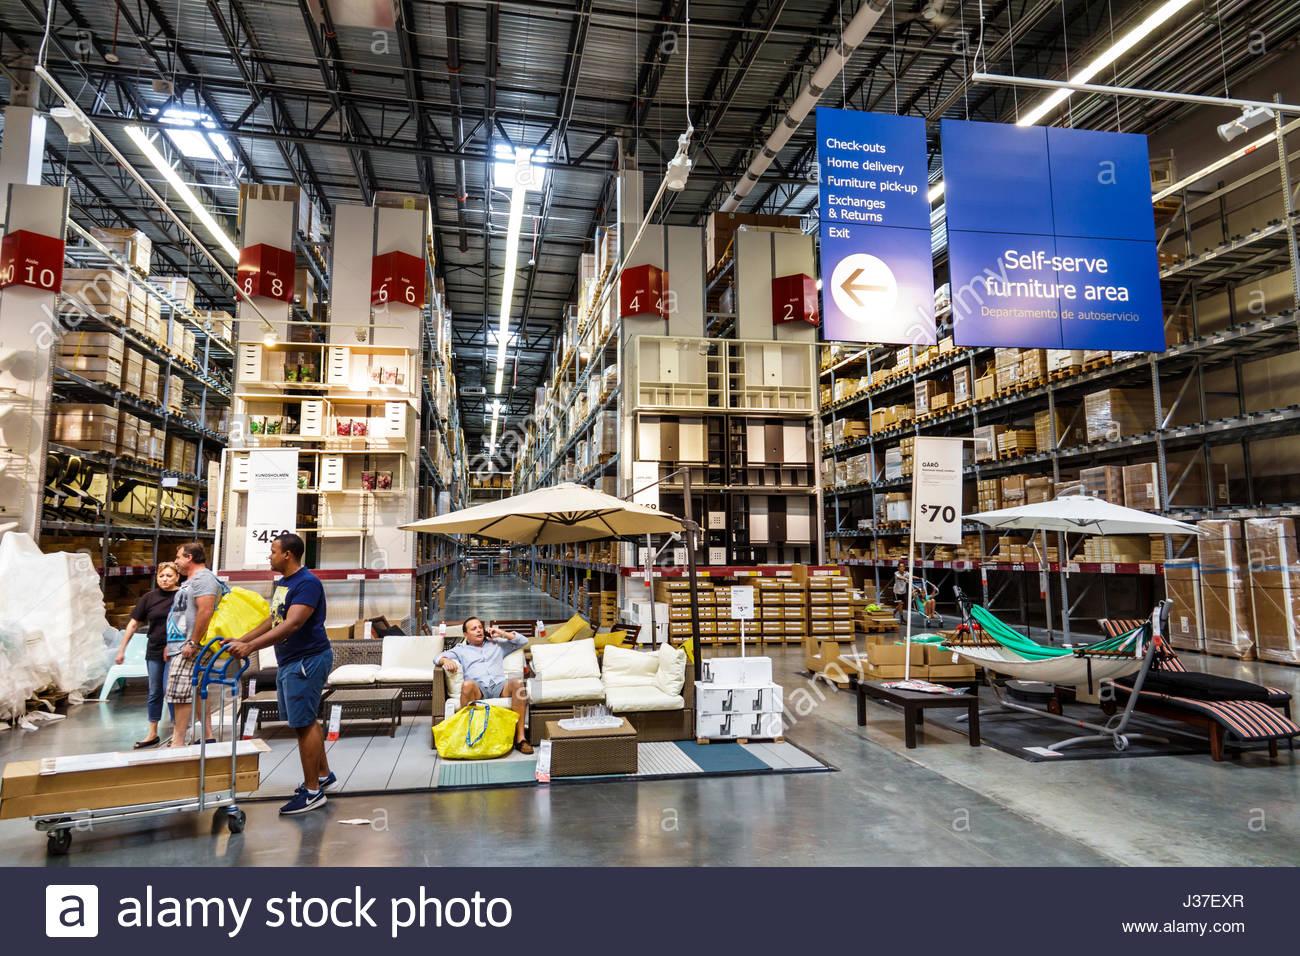 Miami Florida Ikea Store Retailer Furniture Home Accessories Shopping Stock Photo Royalty Free